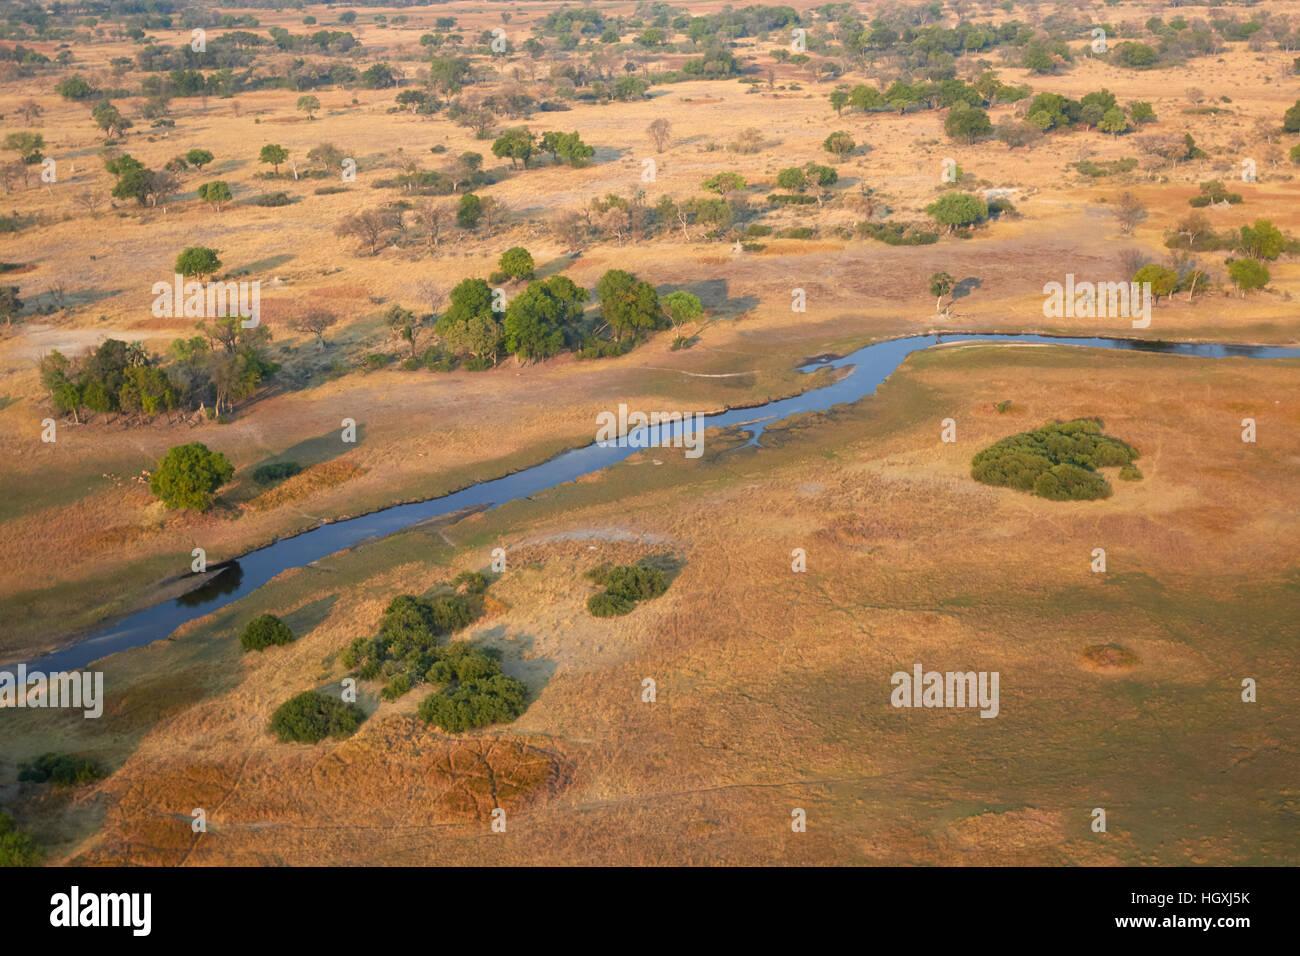 Okavango Delta in the dry season, Botswana - Stock Image